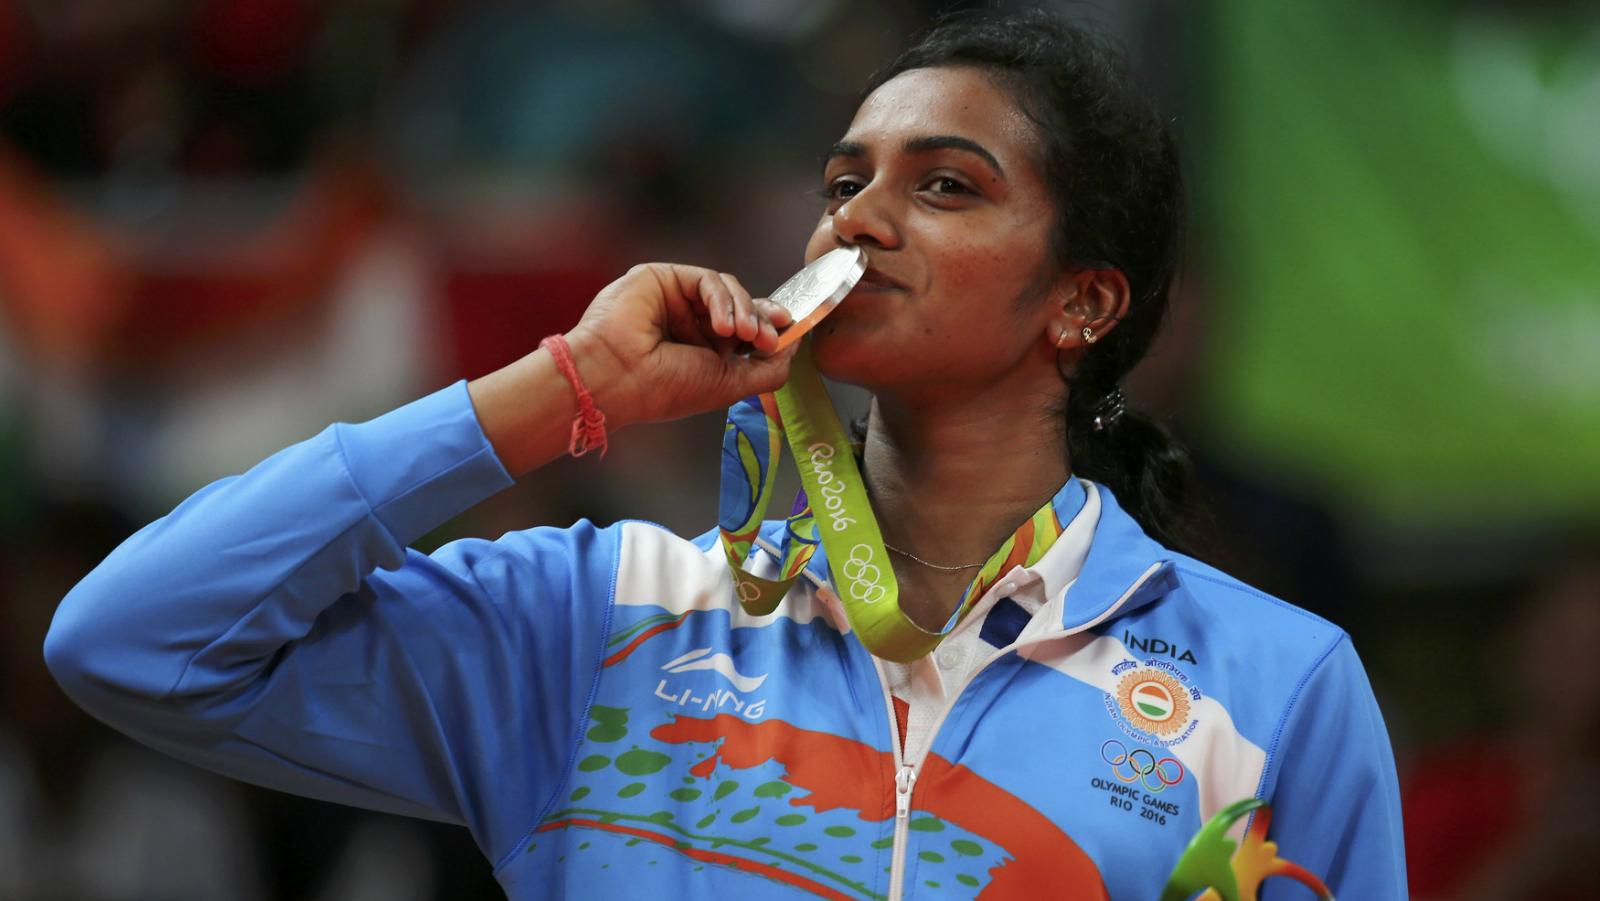 India-Olympics-Rio 2016-Narendra Modi-Olympic medals